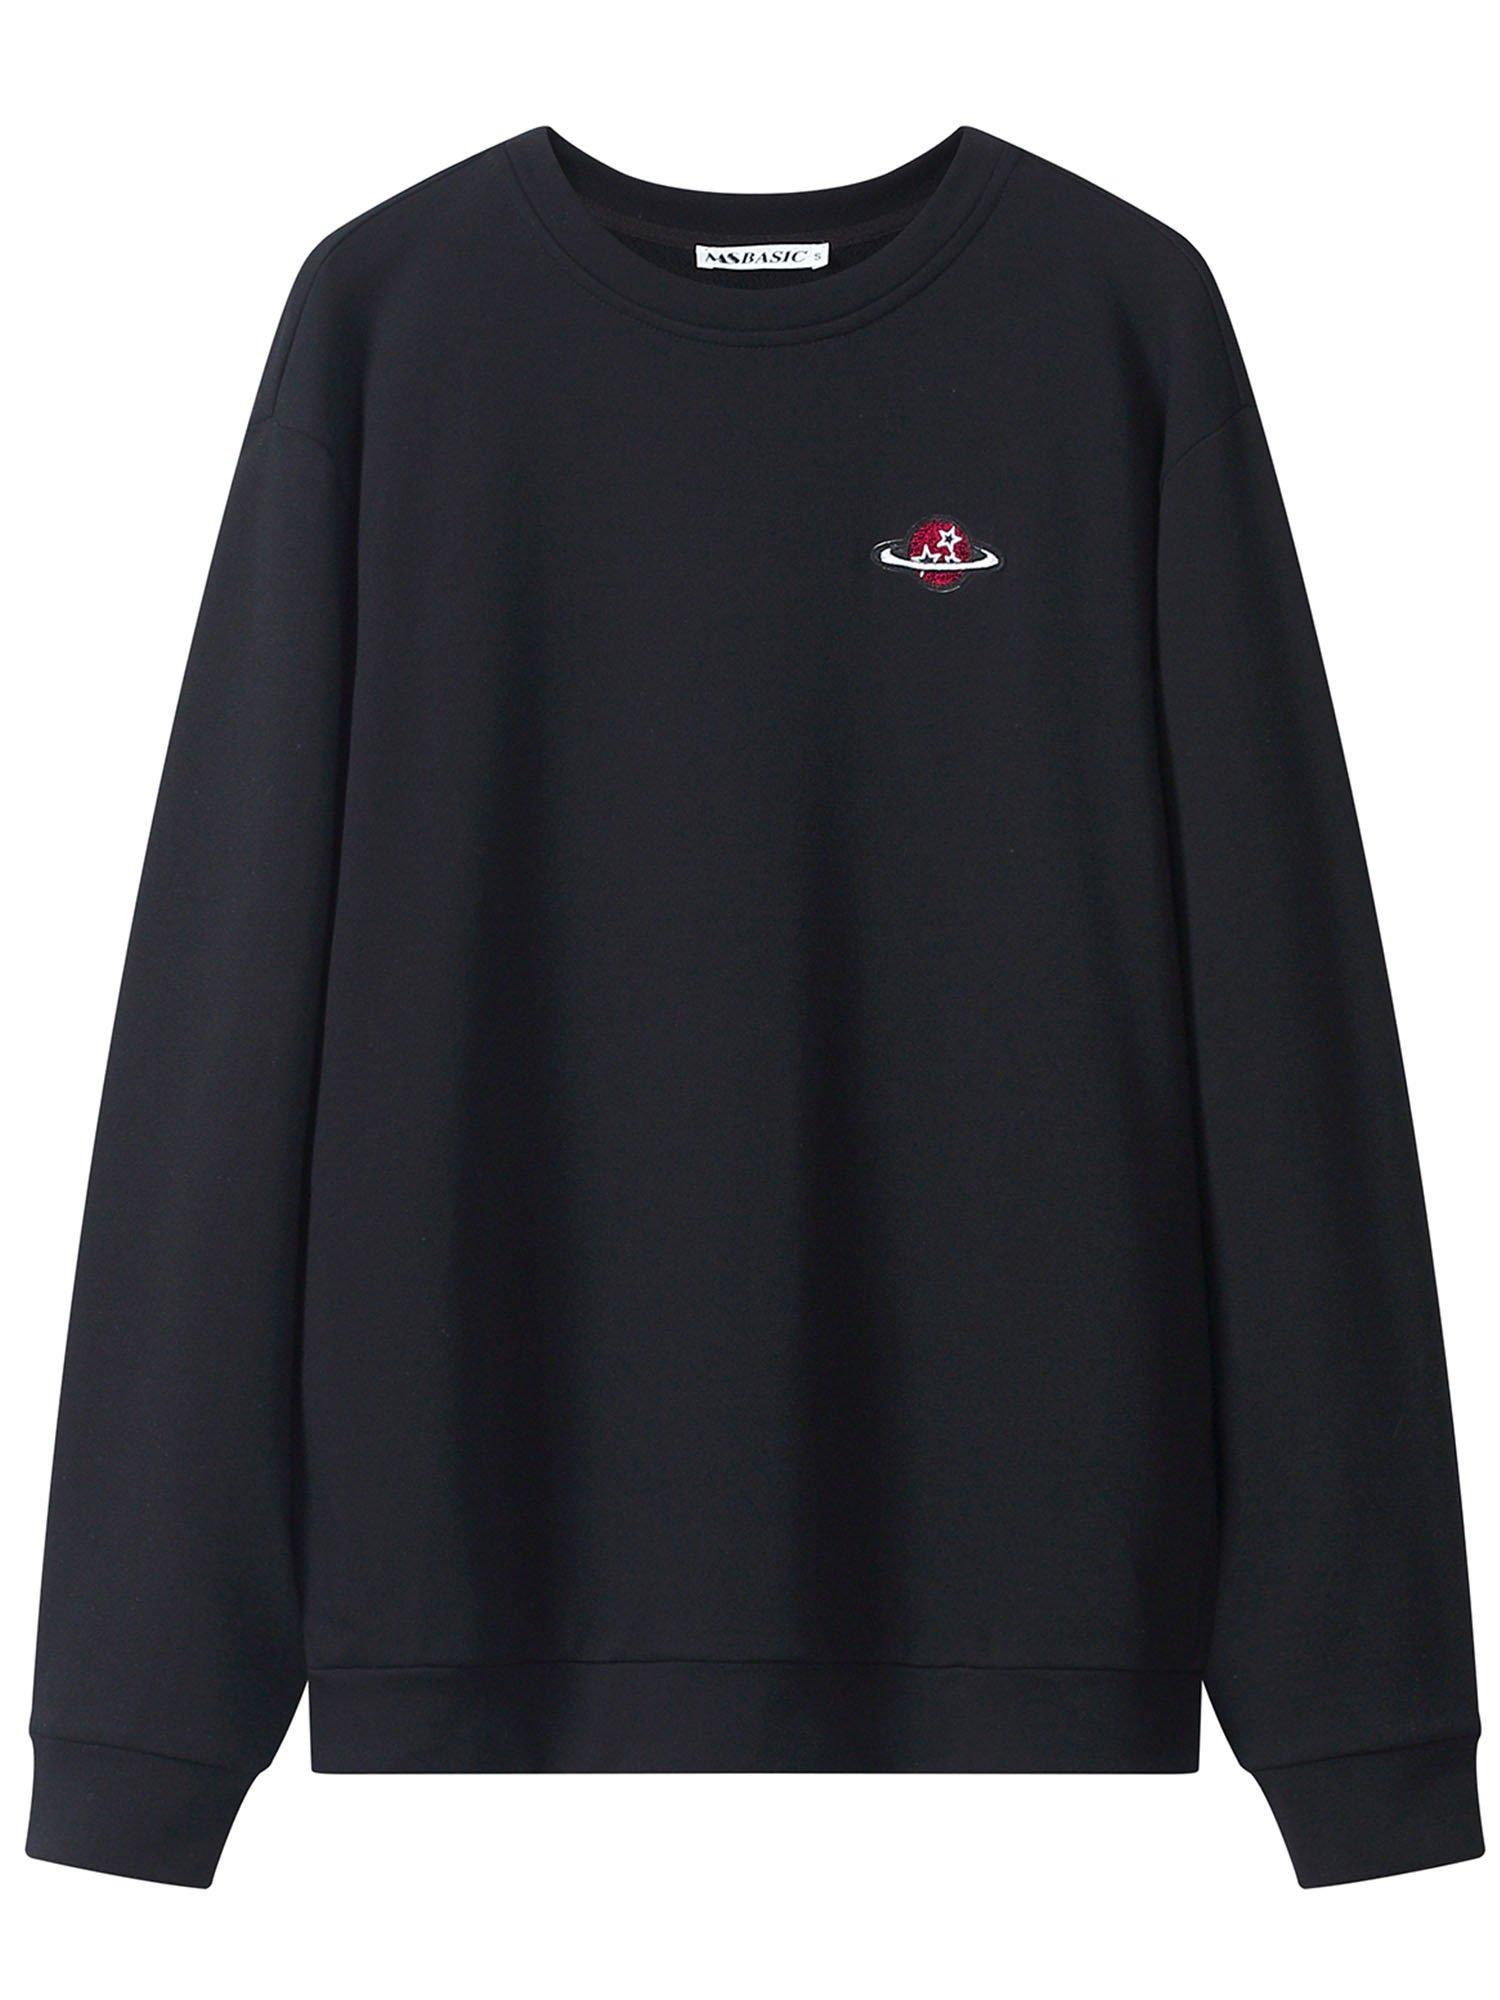 MSBASIC Ladies Sweatshirts, Cute Sweatshirts for Women L